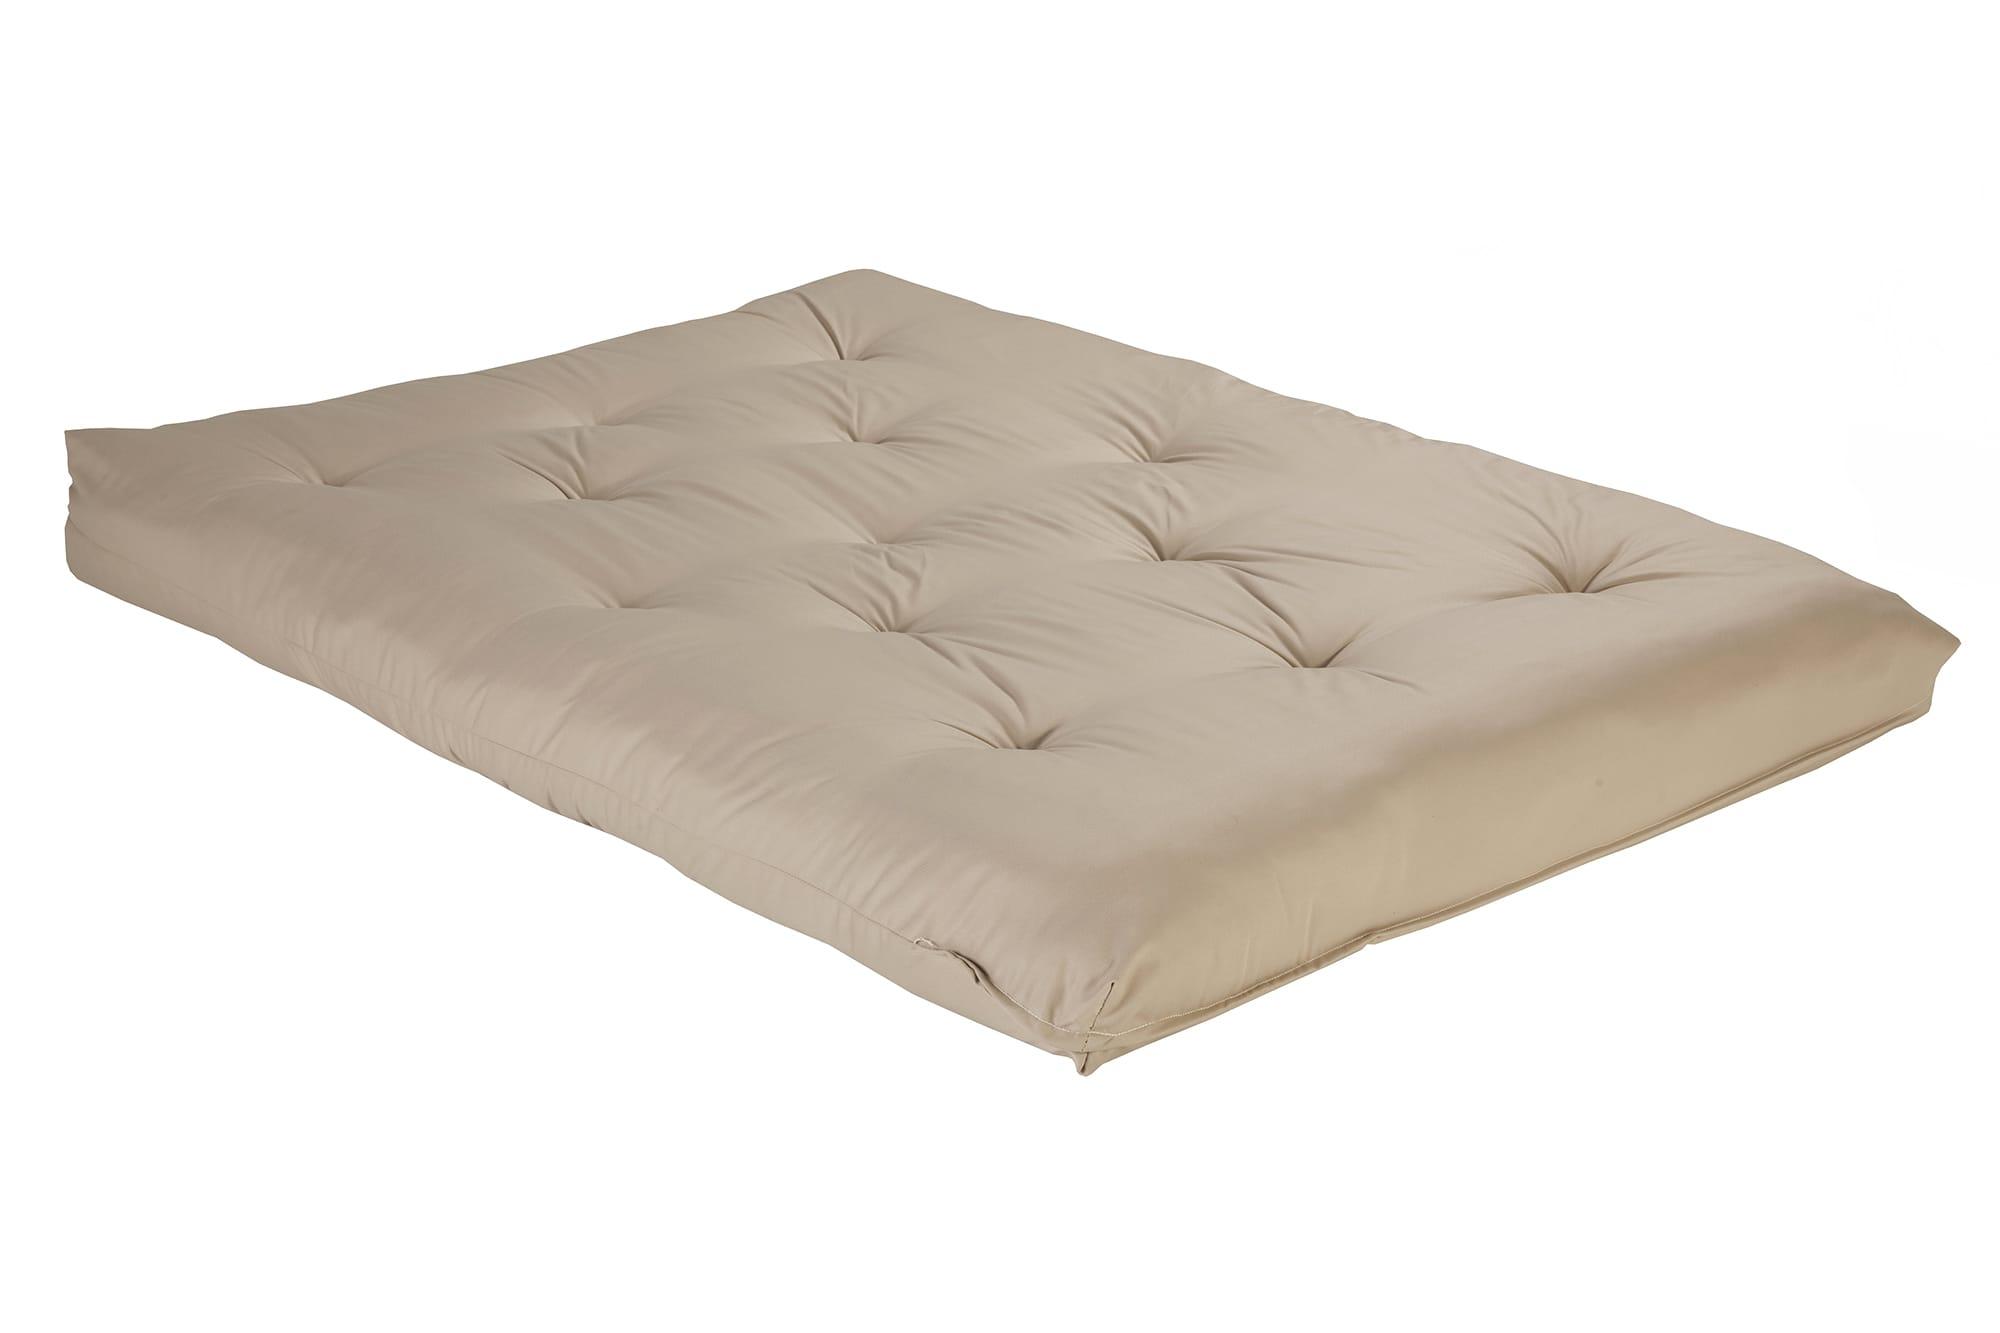 Fashion Bed Innerspring Futon Mattress